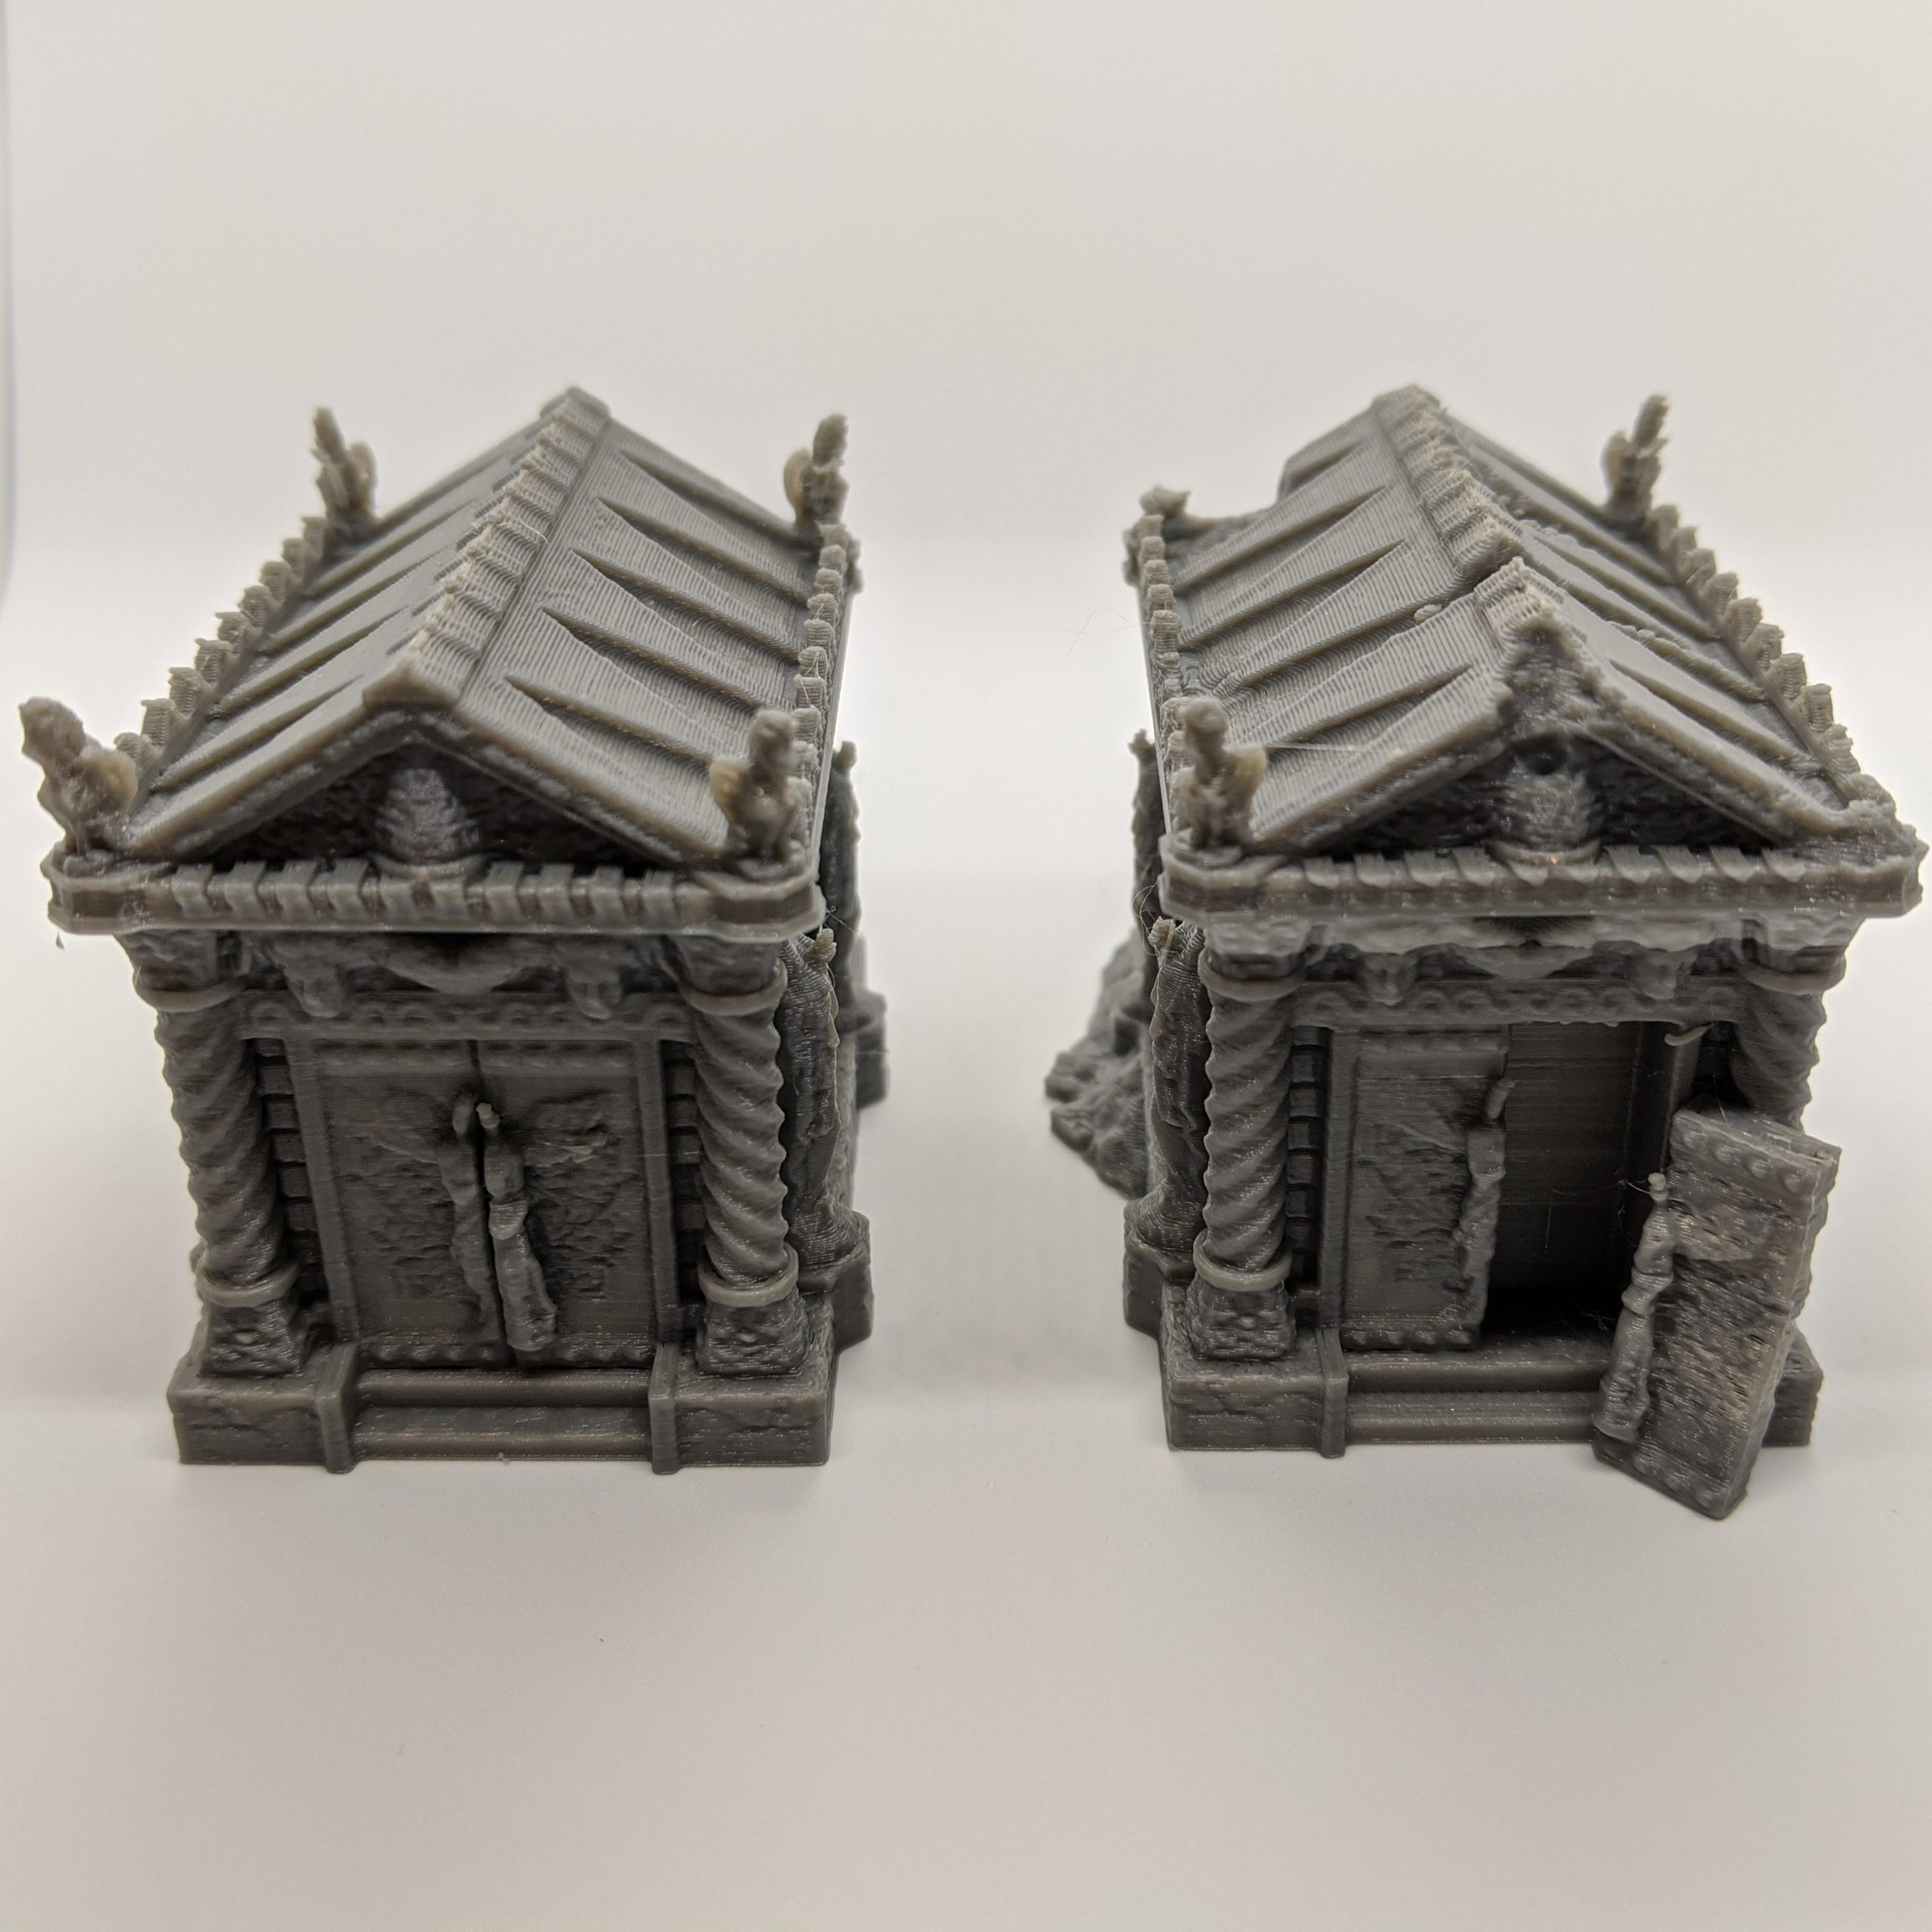 Tomb / Mausoleum – 28mm Wargames